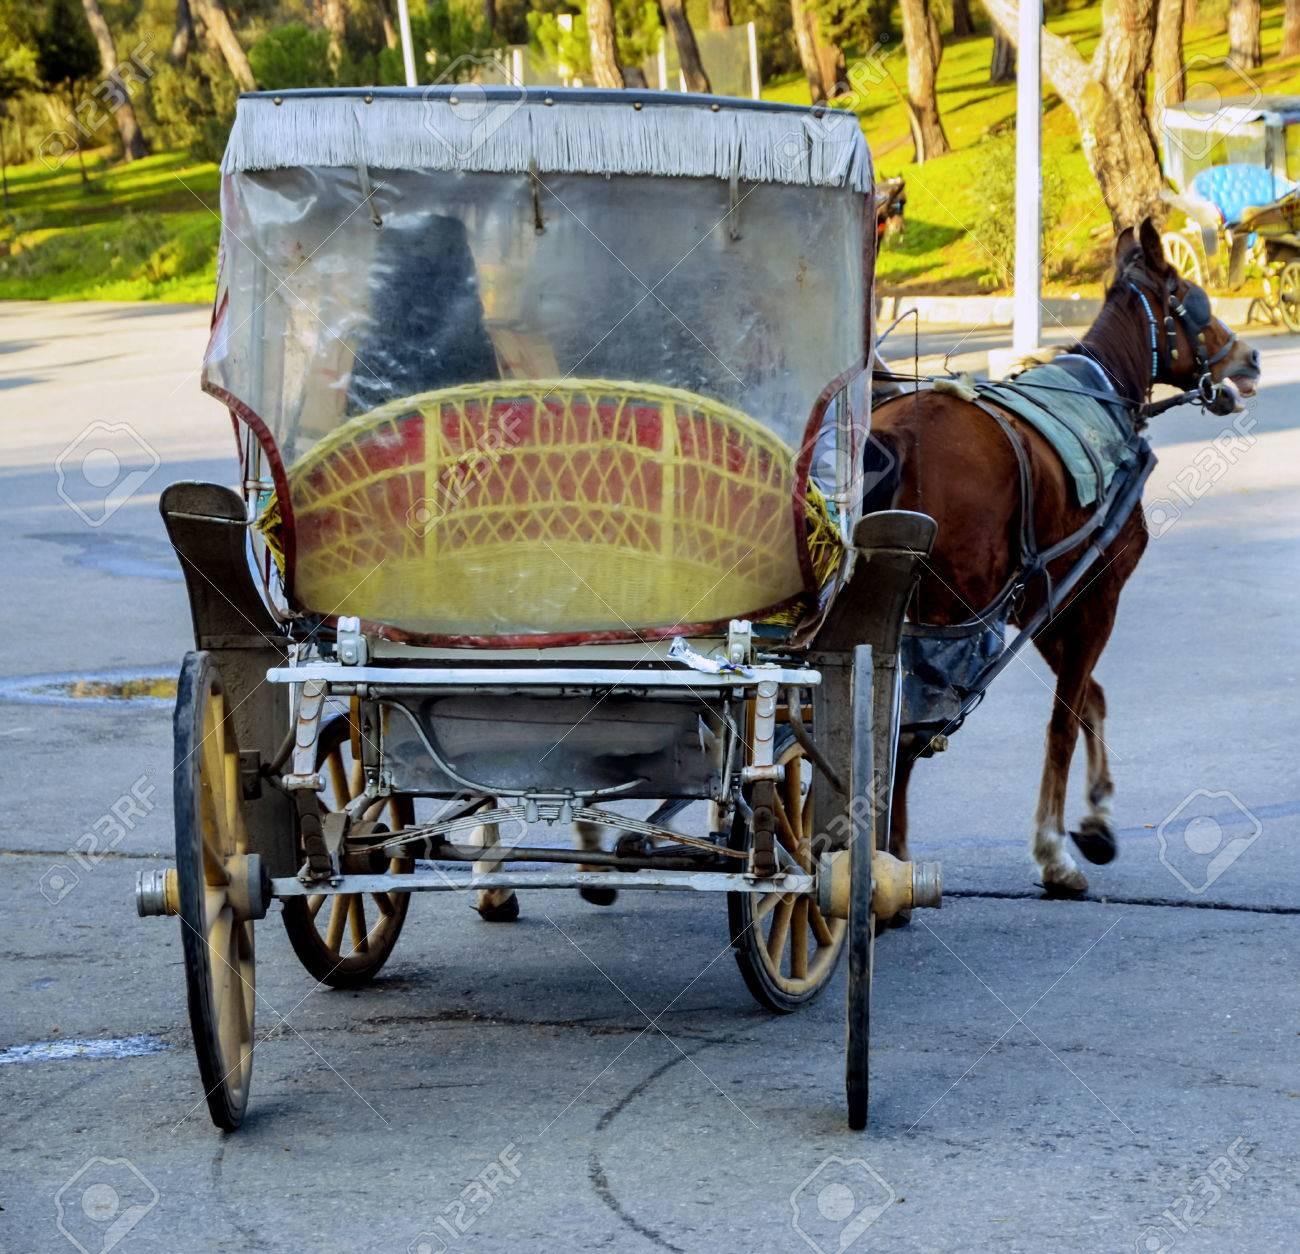 Phaeton, Horse carriage. The symbol of the horse transportation is the transportation vehicle phaetons. - 68348025